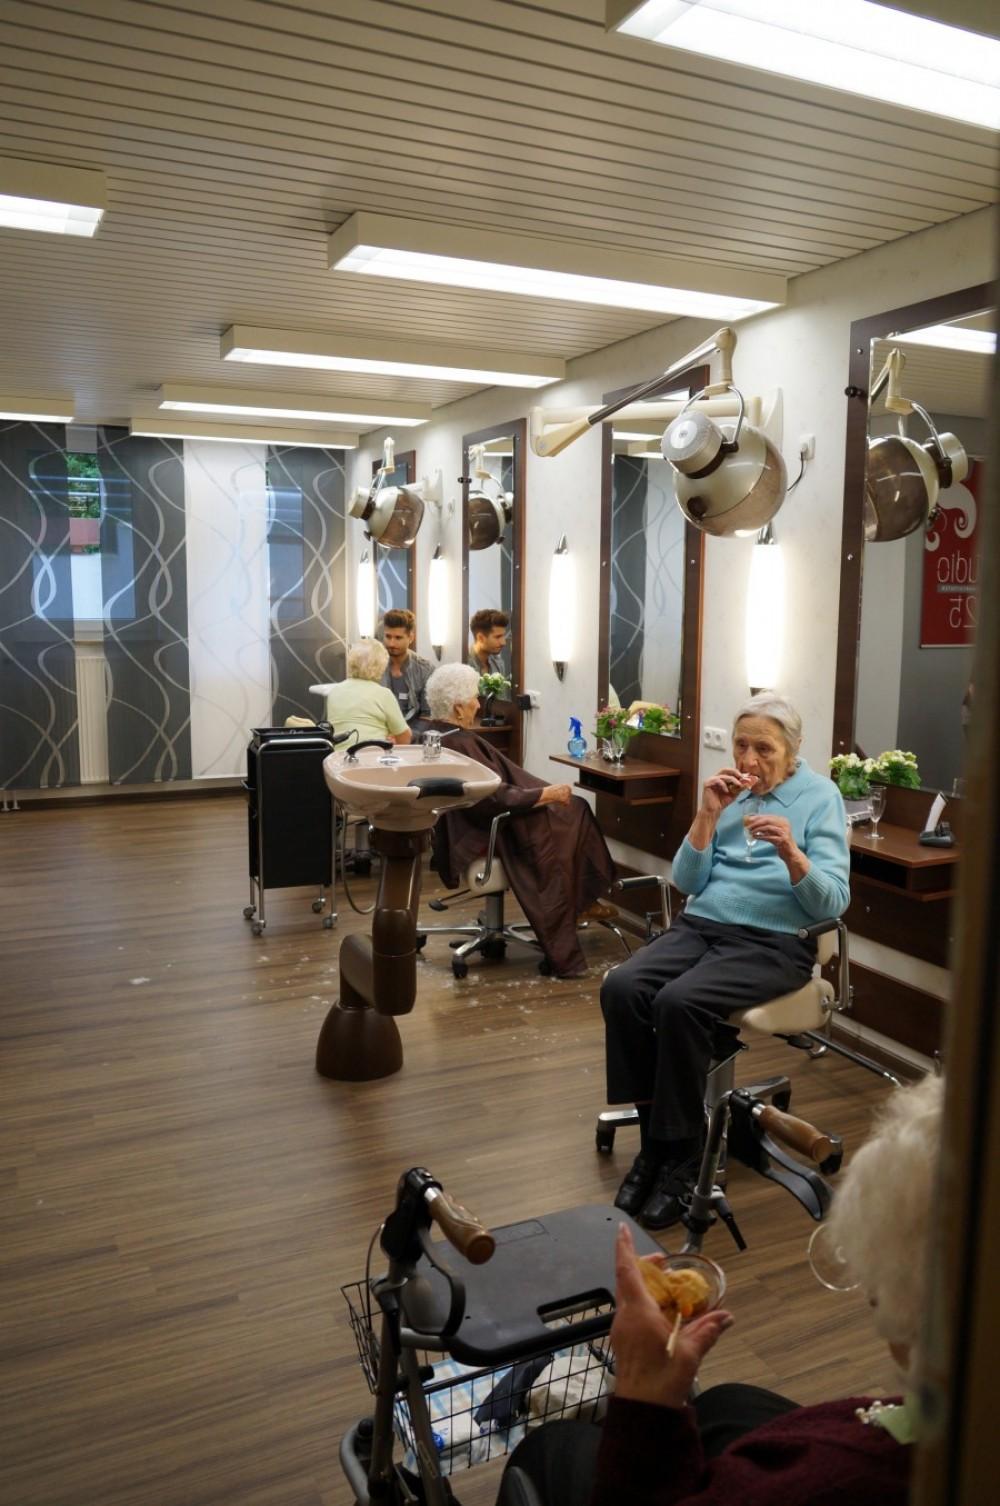 sektempfang haus gehrden studio 25 ihr friseur in barsinghausen. Black Bedroom Furniture Sets. Home Design Ideas